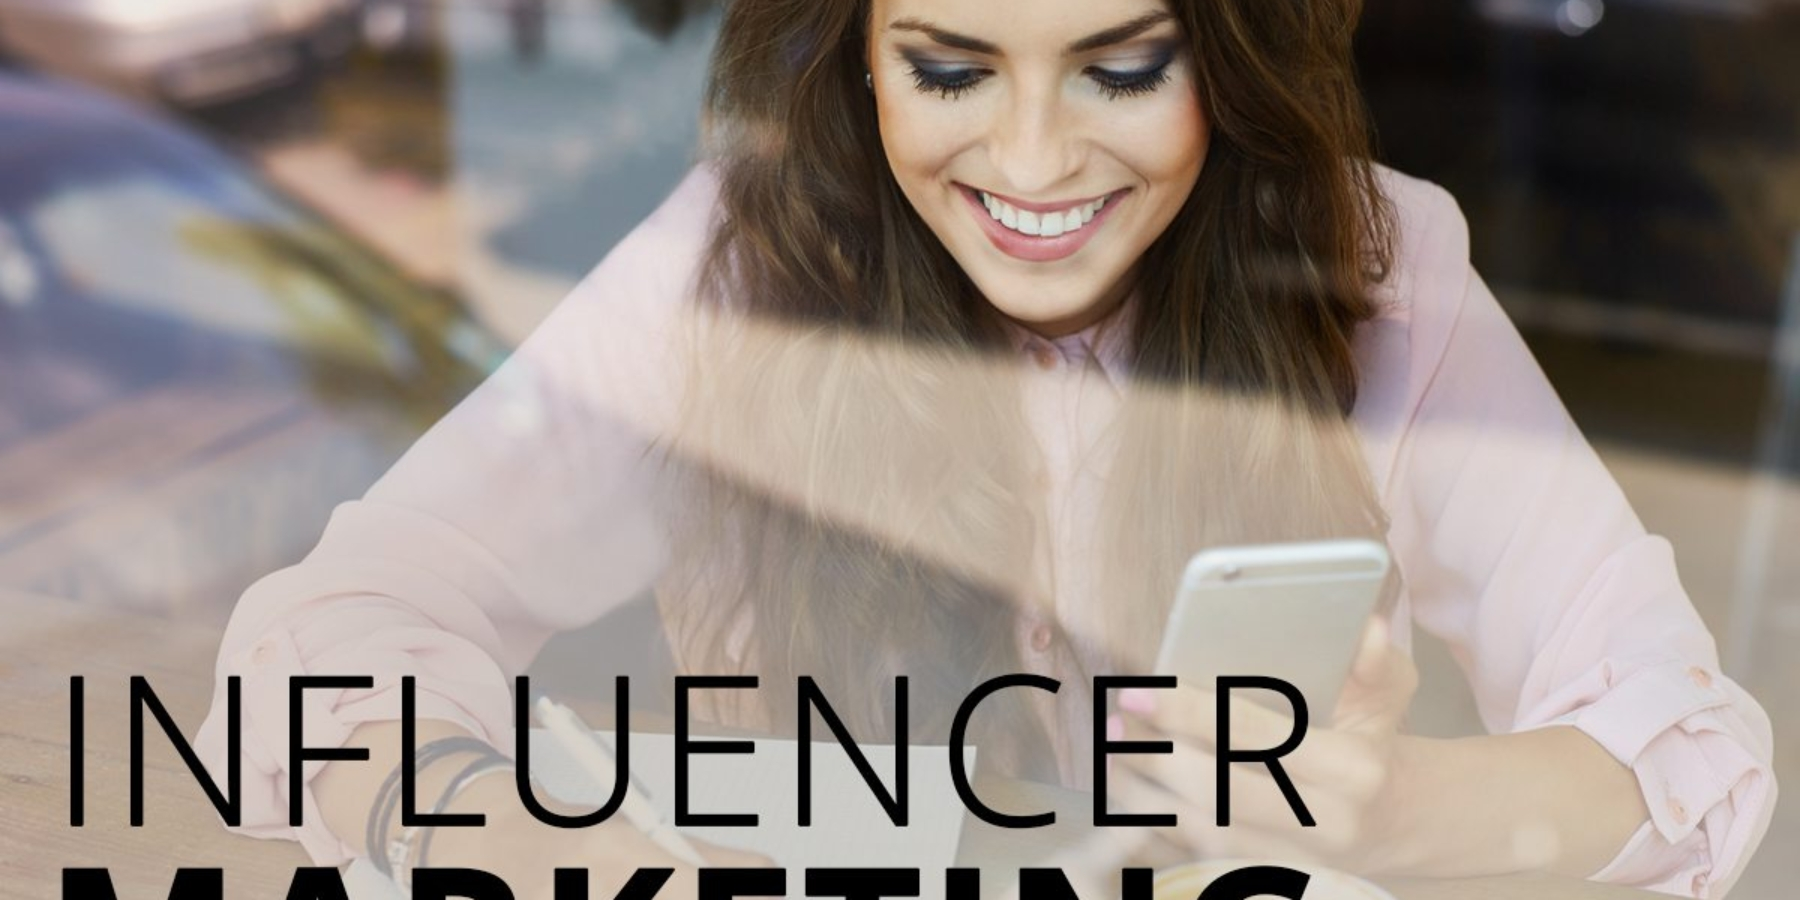 Powstaje kompendium wiedzy natemat influencer marketingu